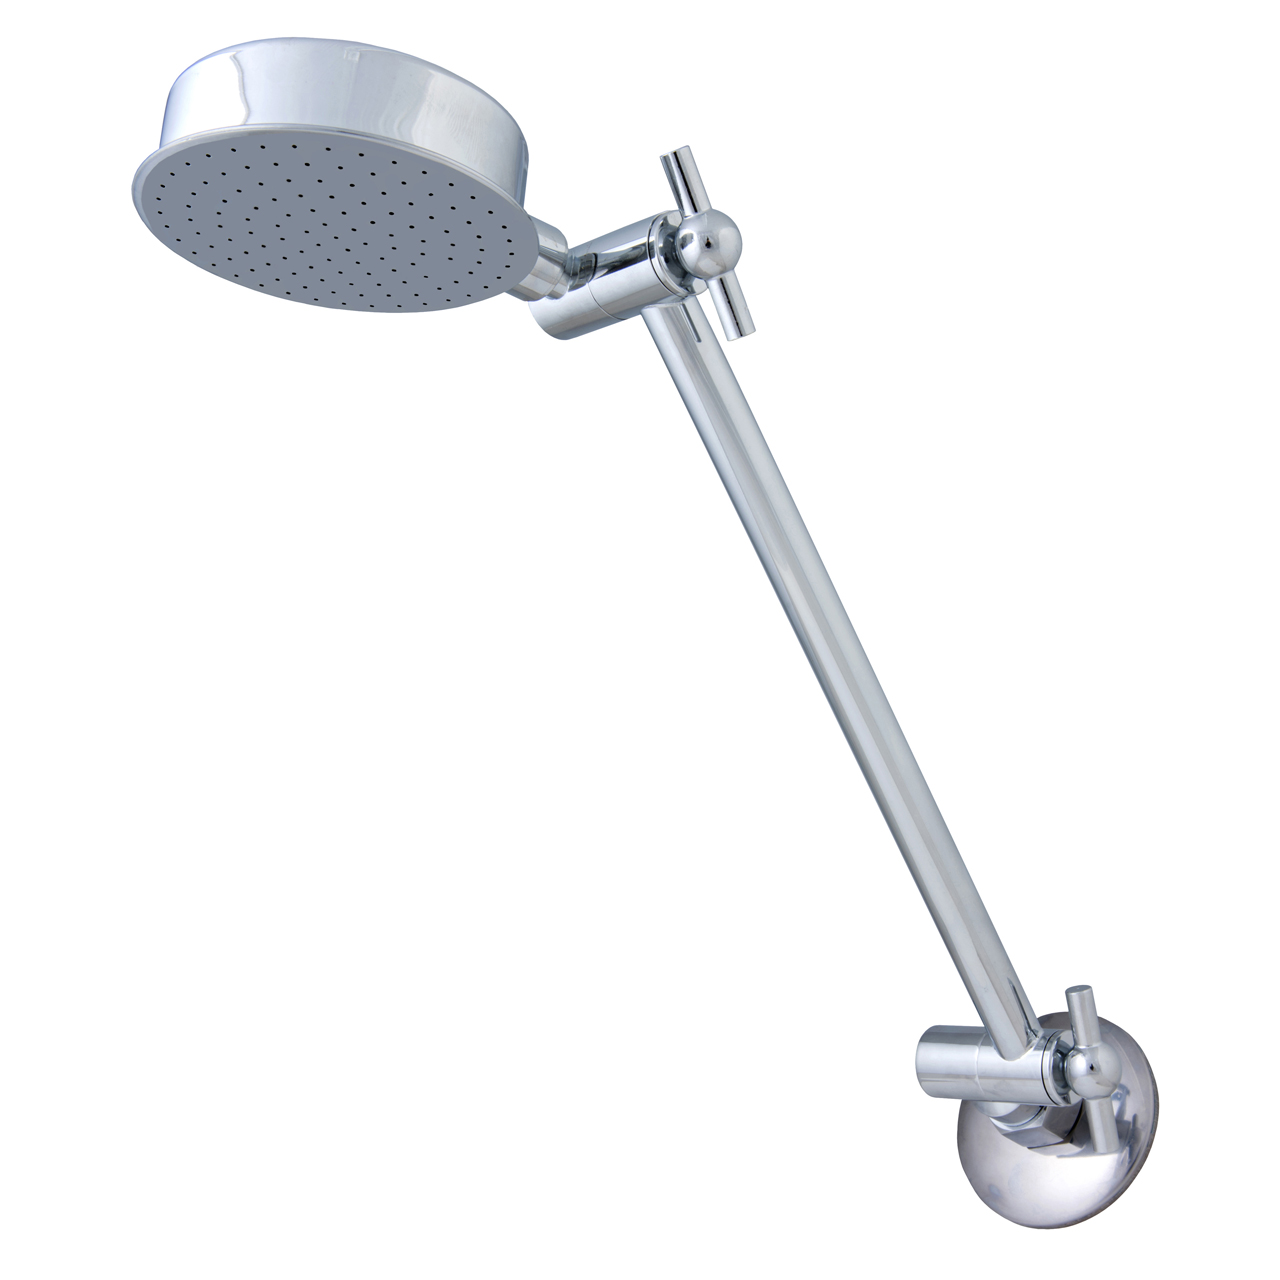 Showermate Series Wonder Shower Head 3 1 2 Chrome